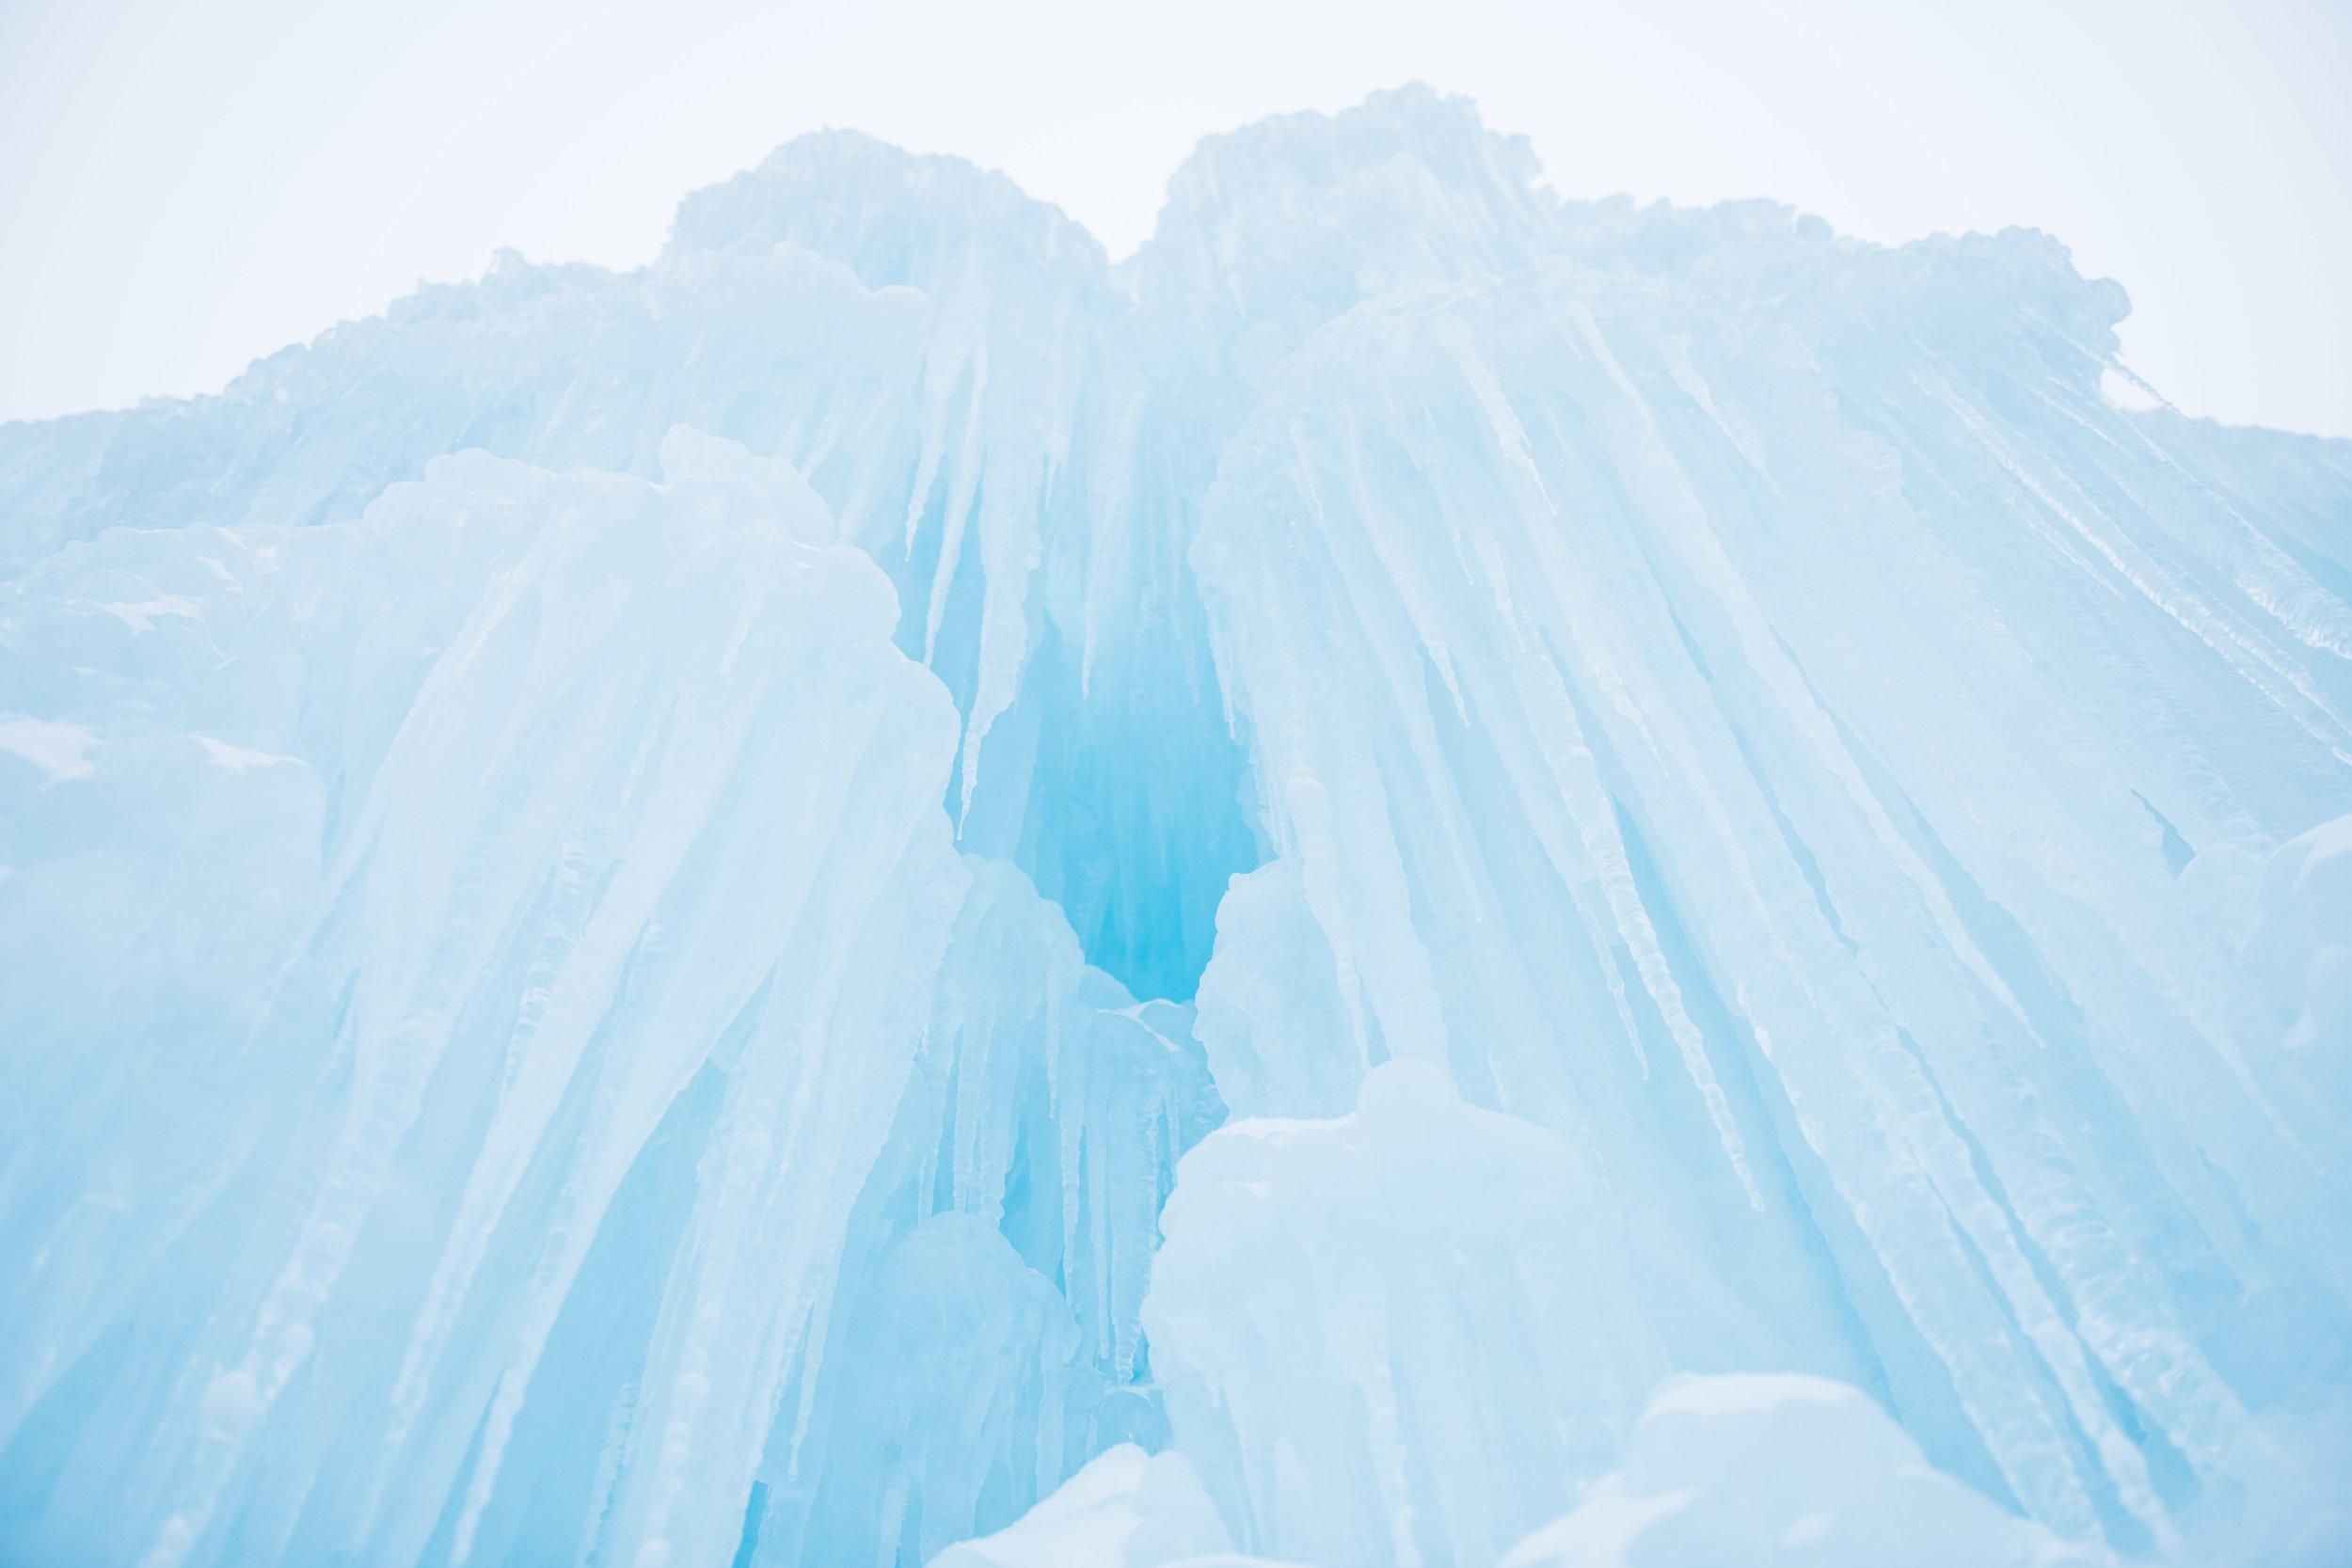 Ice Castles New Hampshire | Boston & New England Adventure Landscape Travel Photography | Lorna Stell Photo